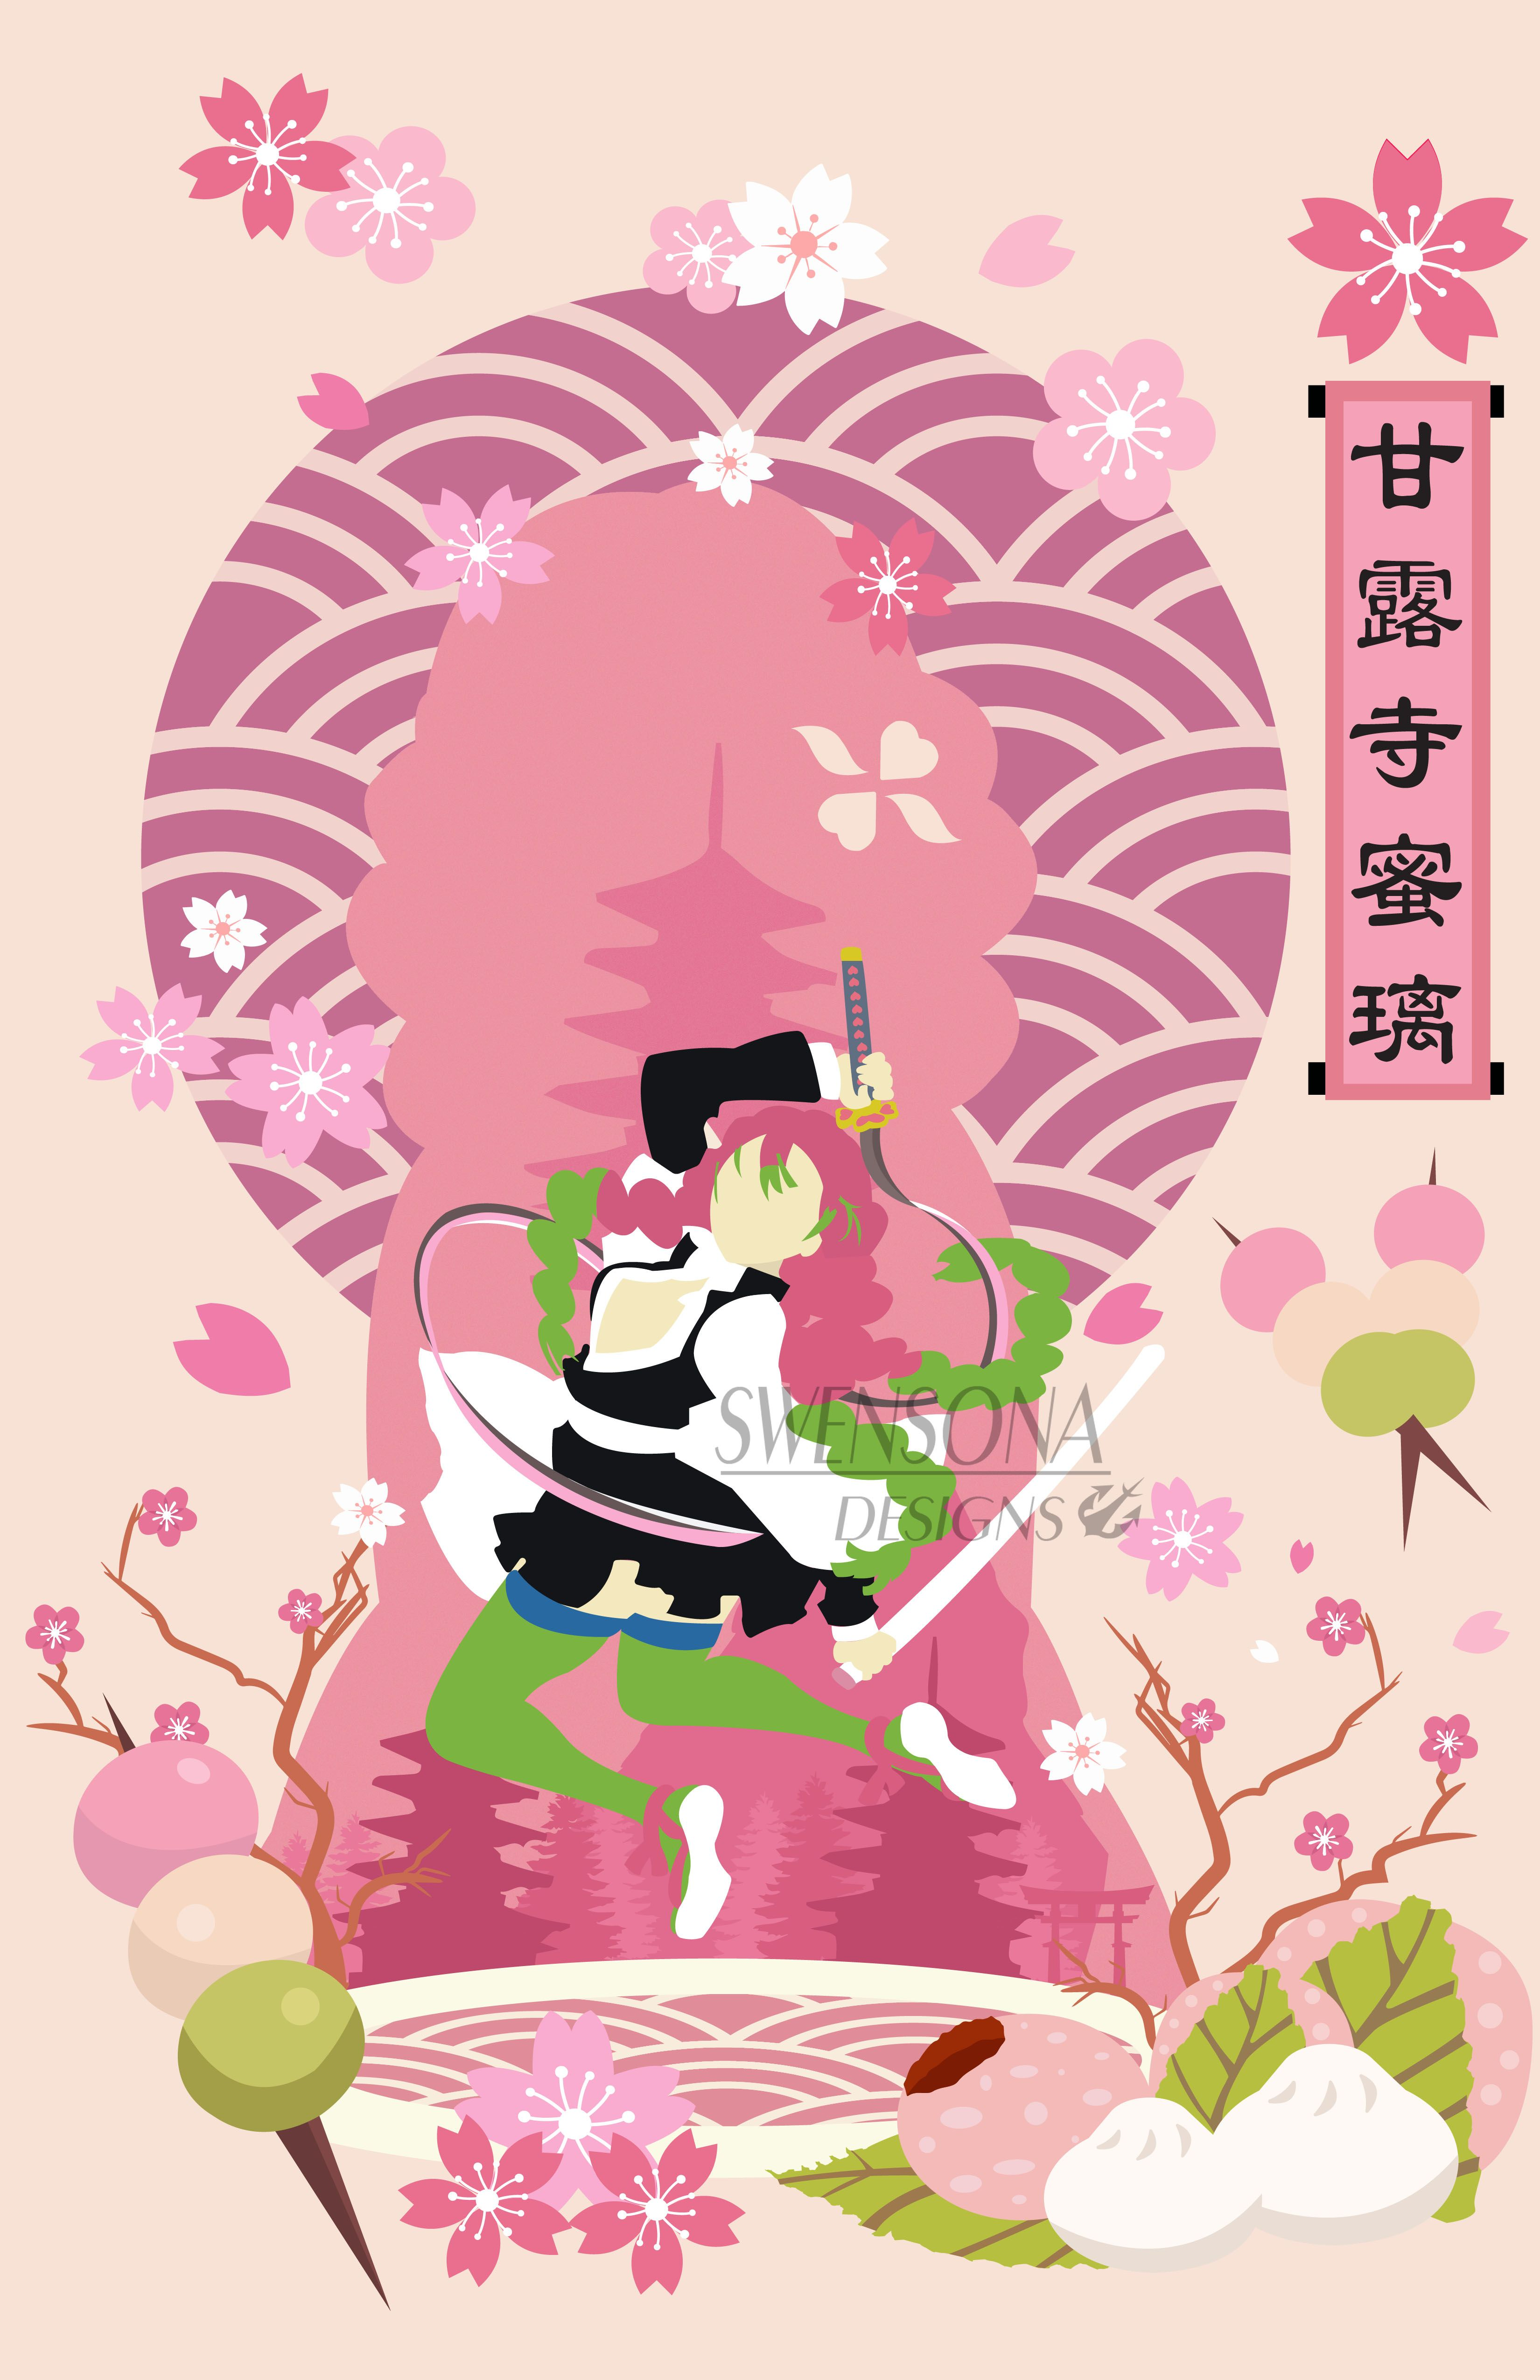 Mitsuri Minimalist Print in 2020 | Anime wallpaper live ...